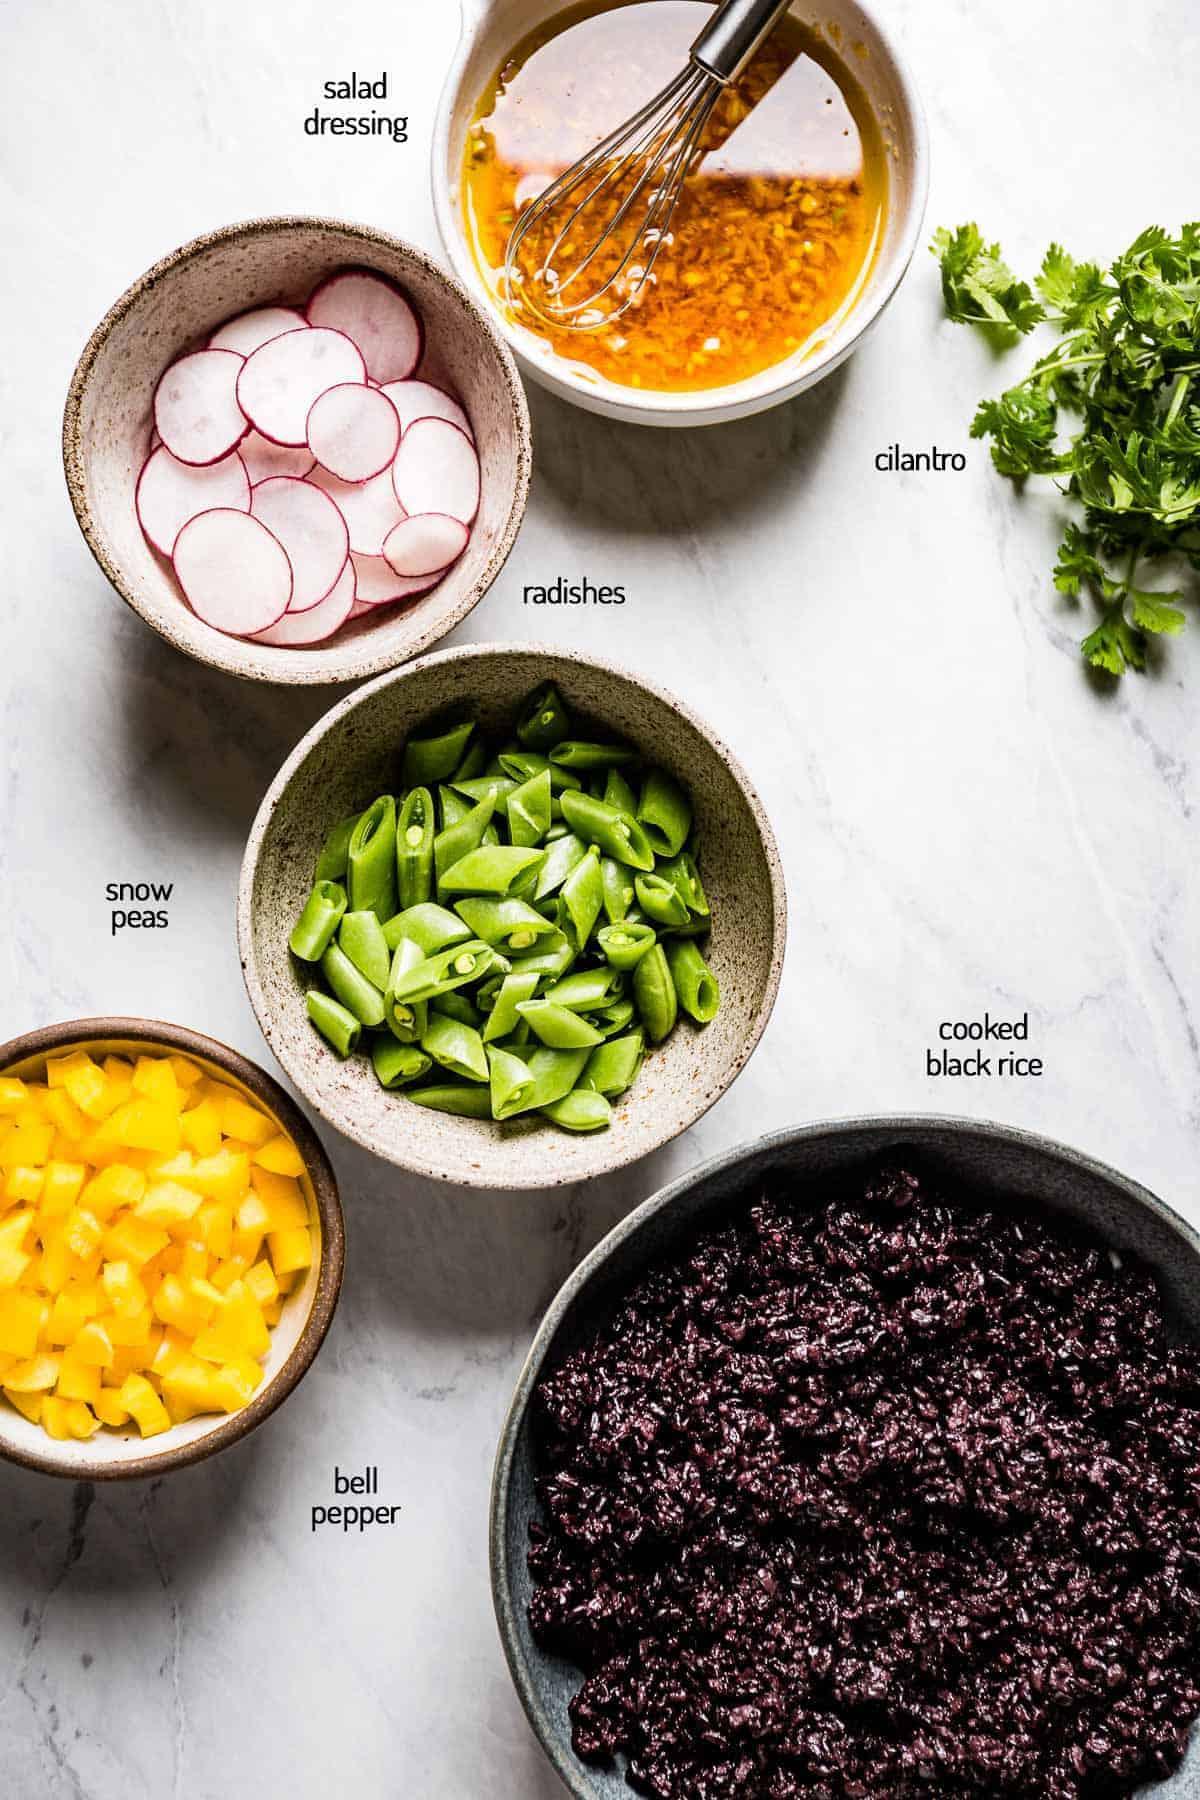 Ingredients for forbidden rice salad